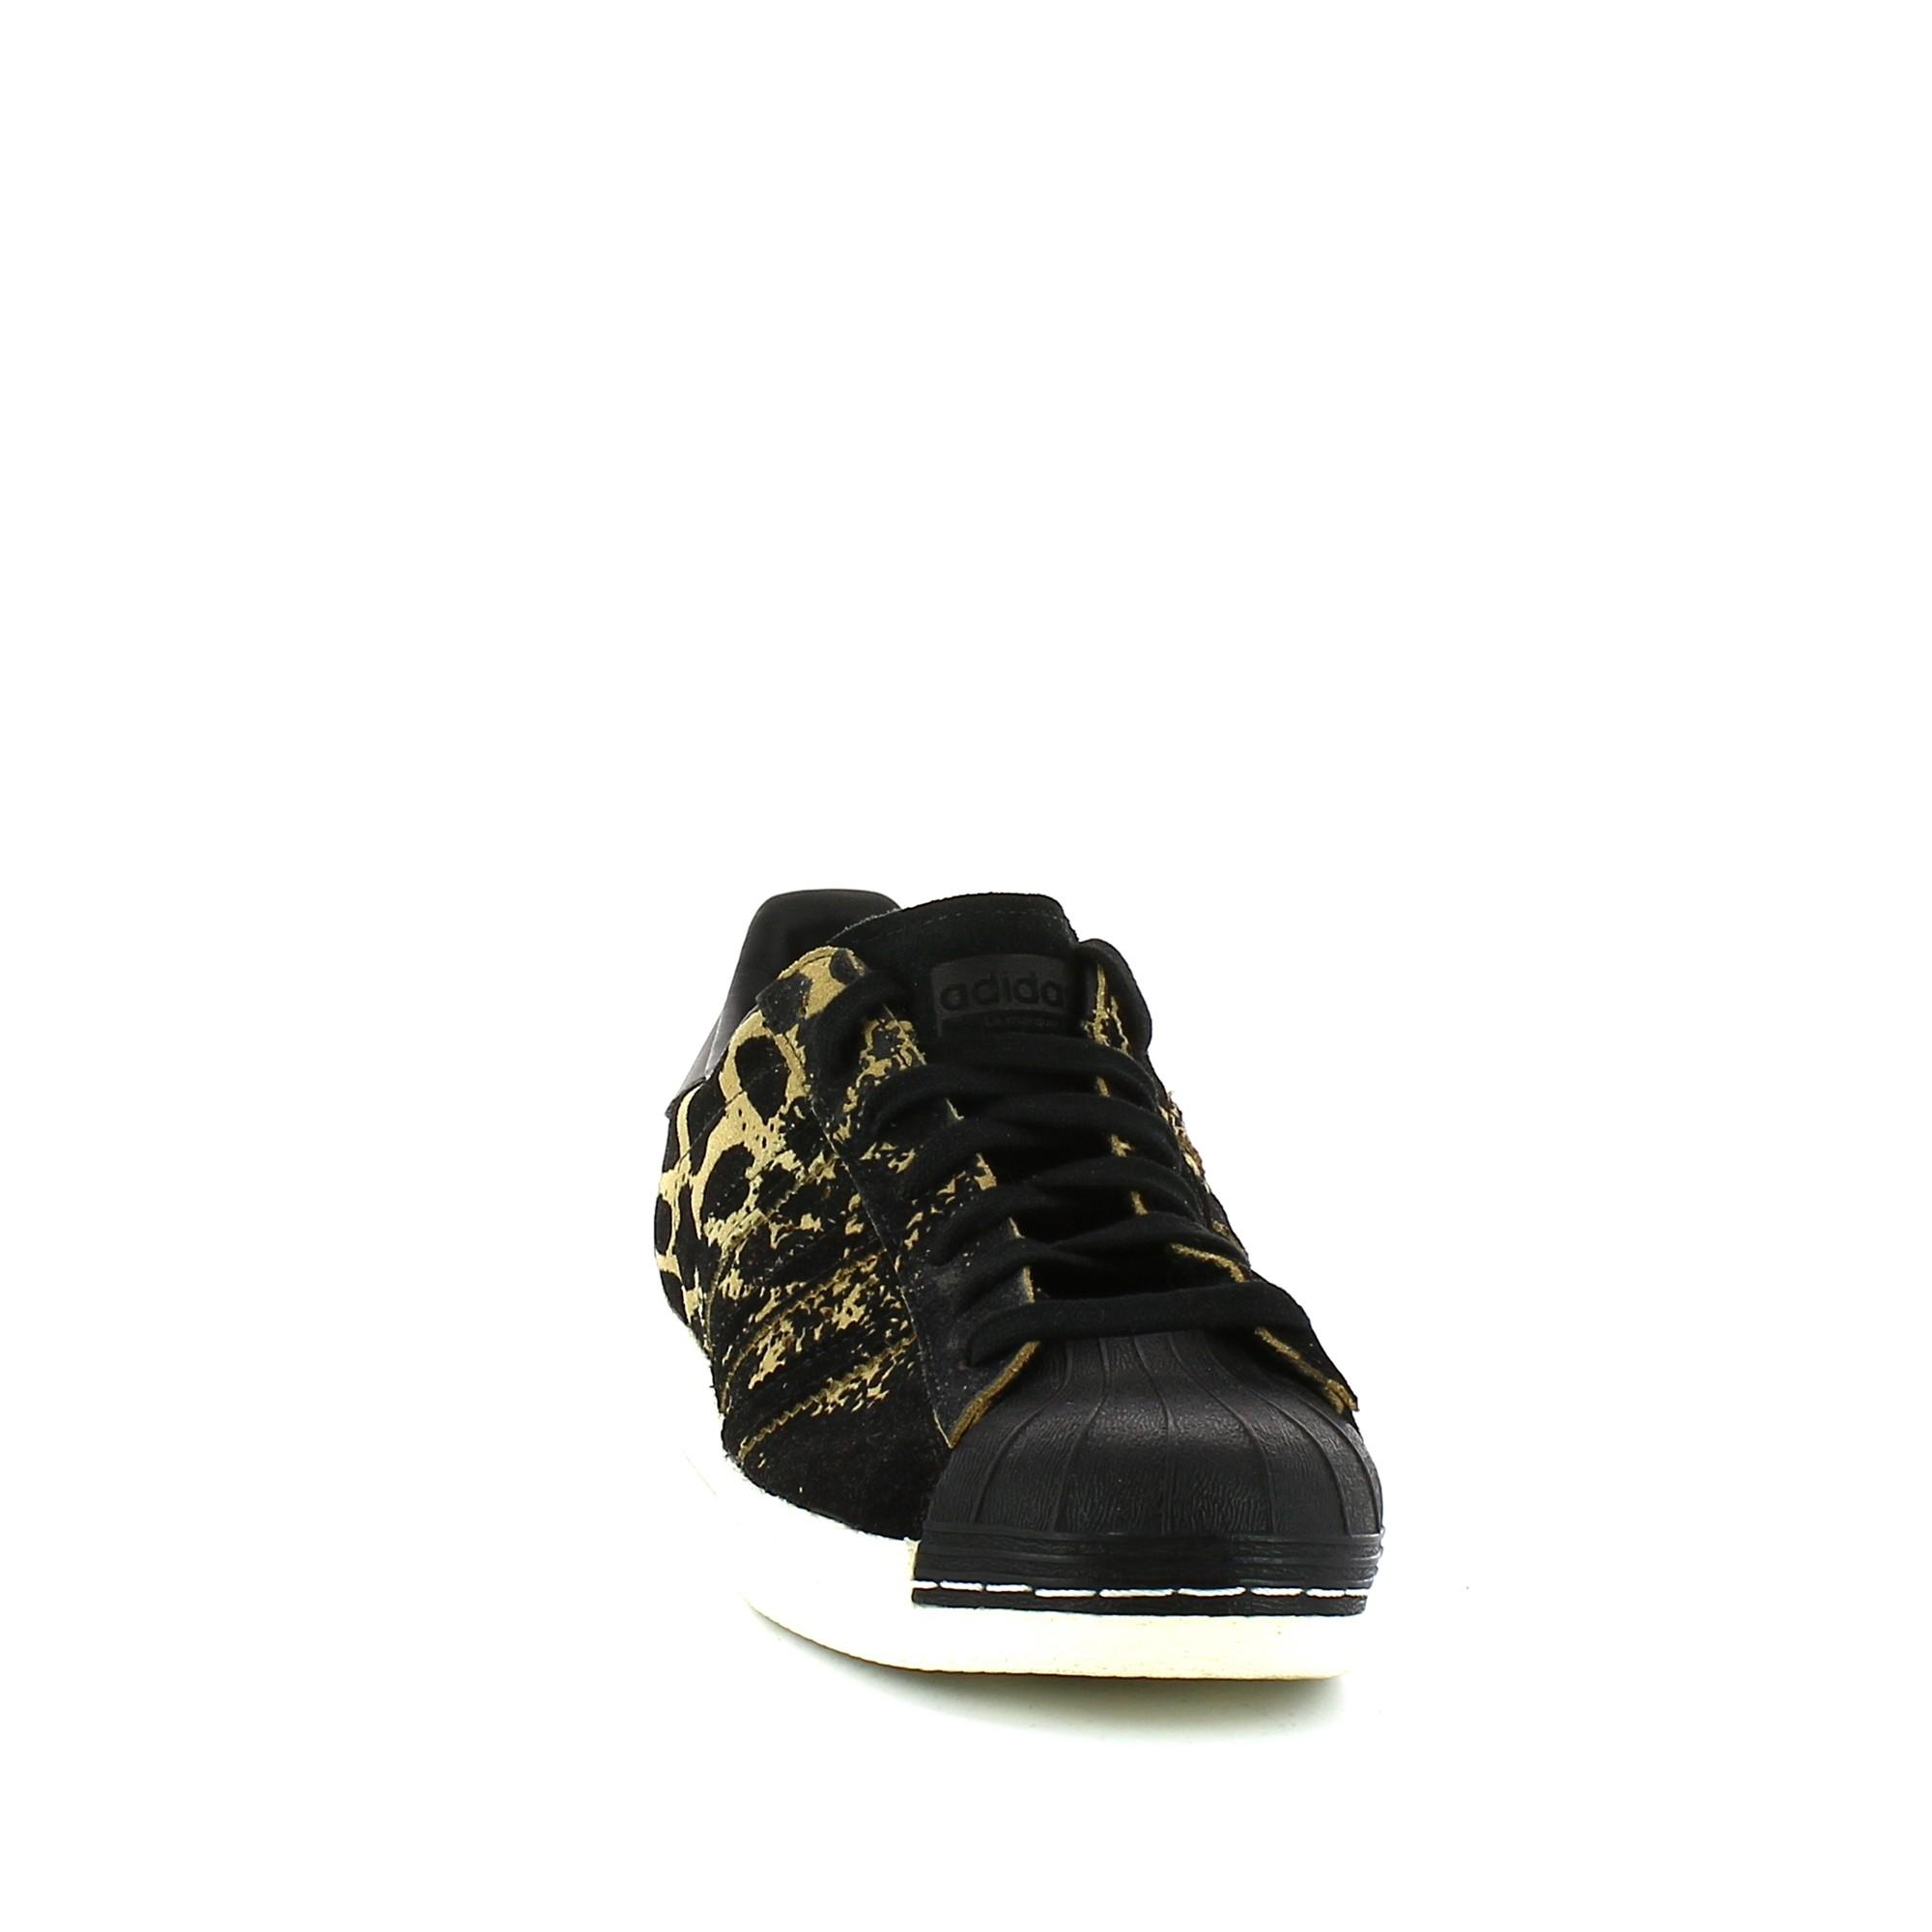 new concept 8792d 692e0 W Deportes 80s Zapatillas Leopardo Moya Negro Superstar Adidas Mujer  OtwqwEPf